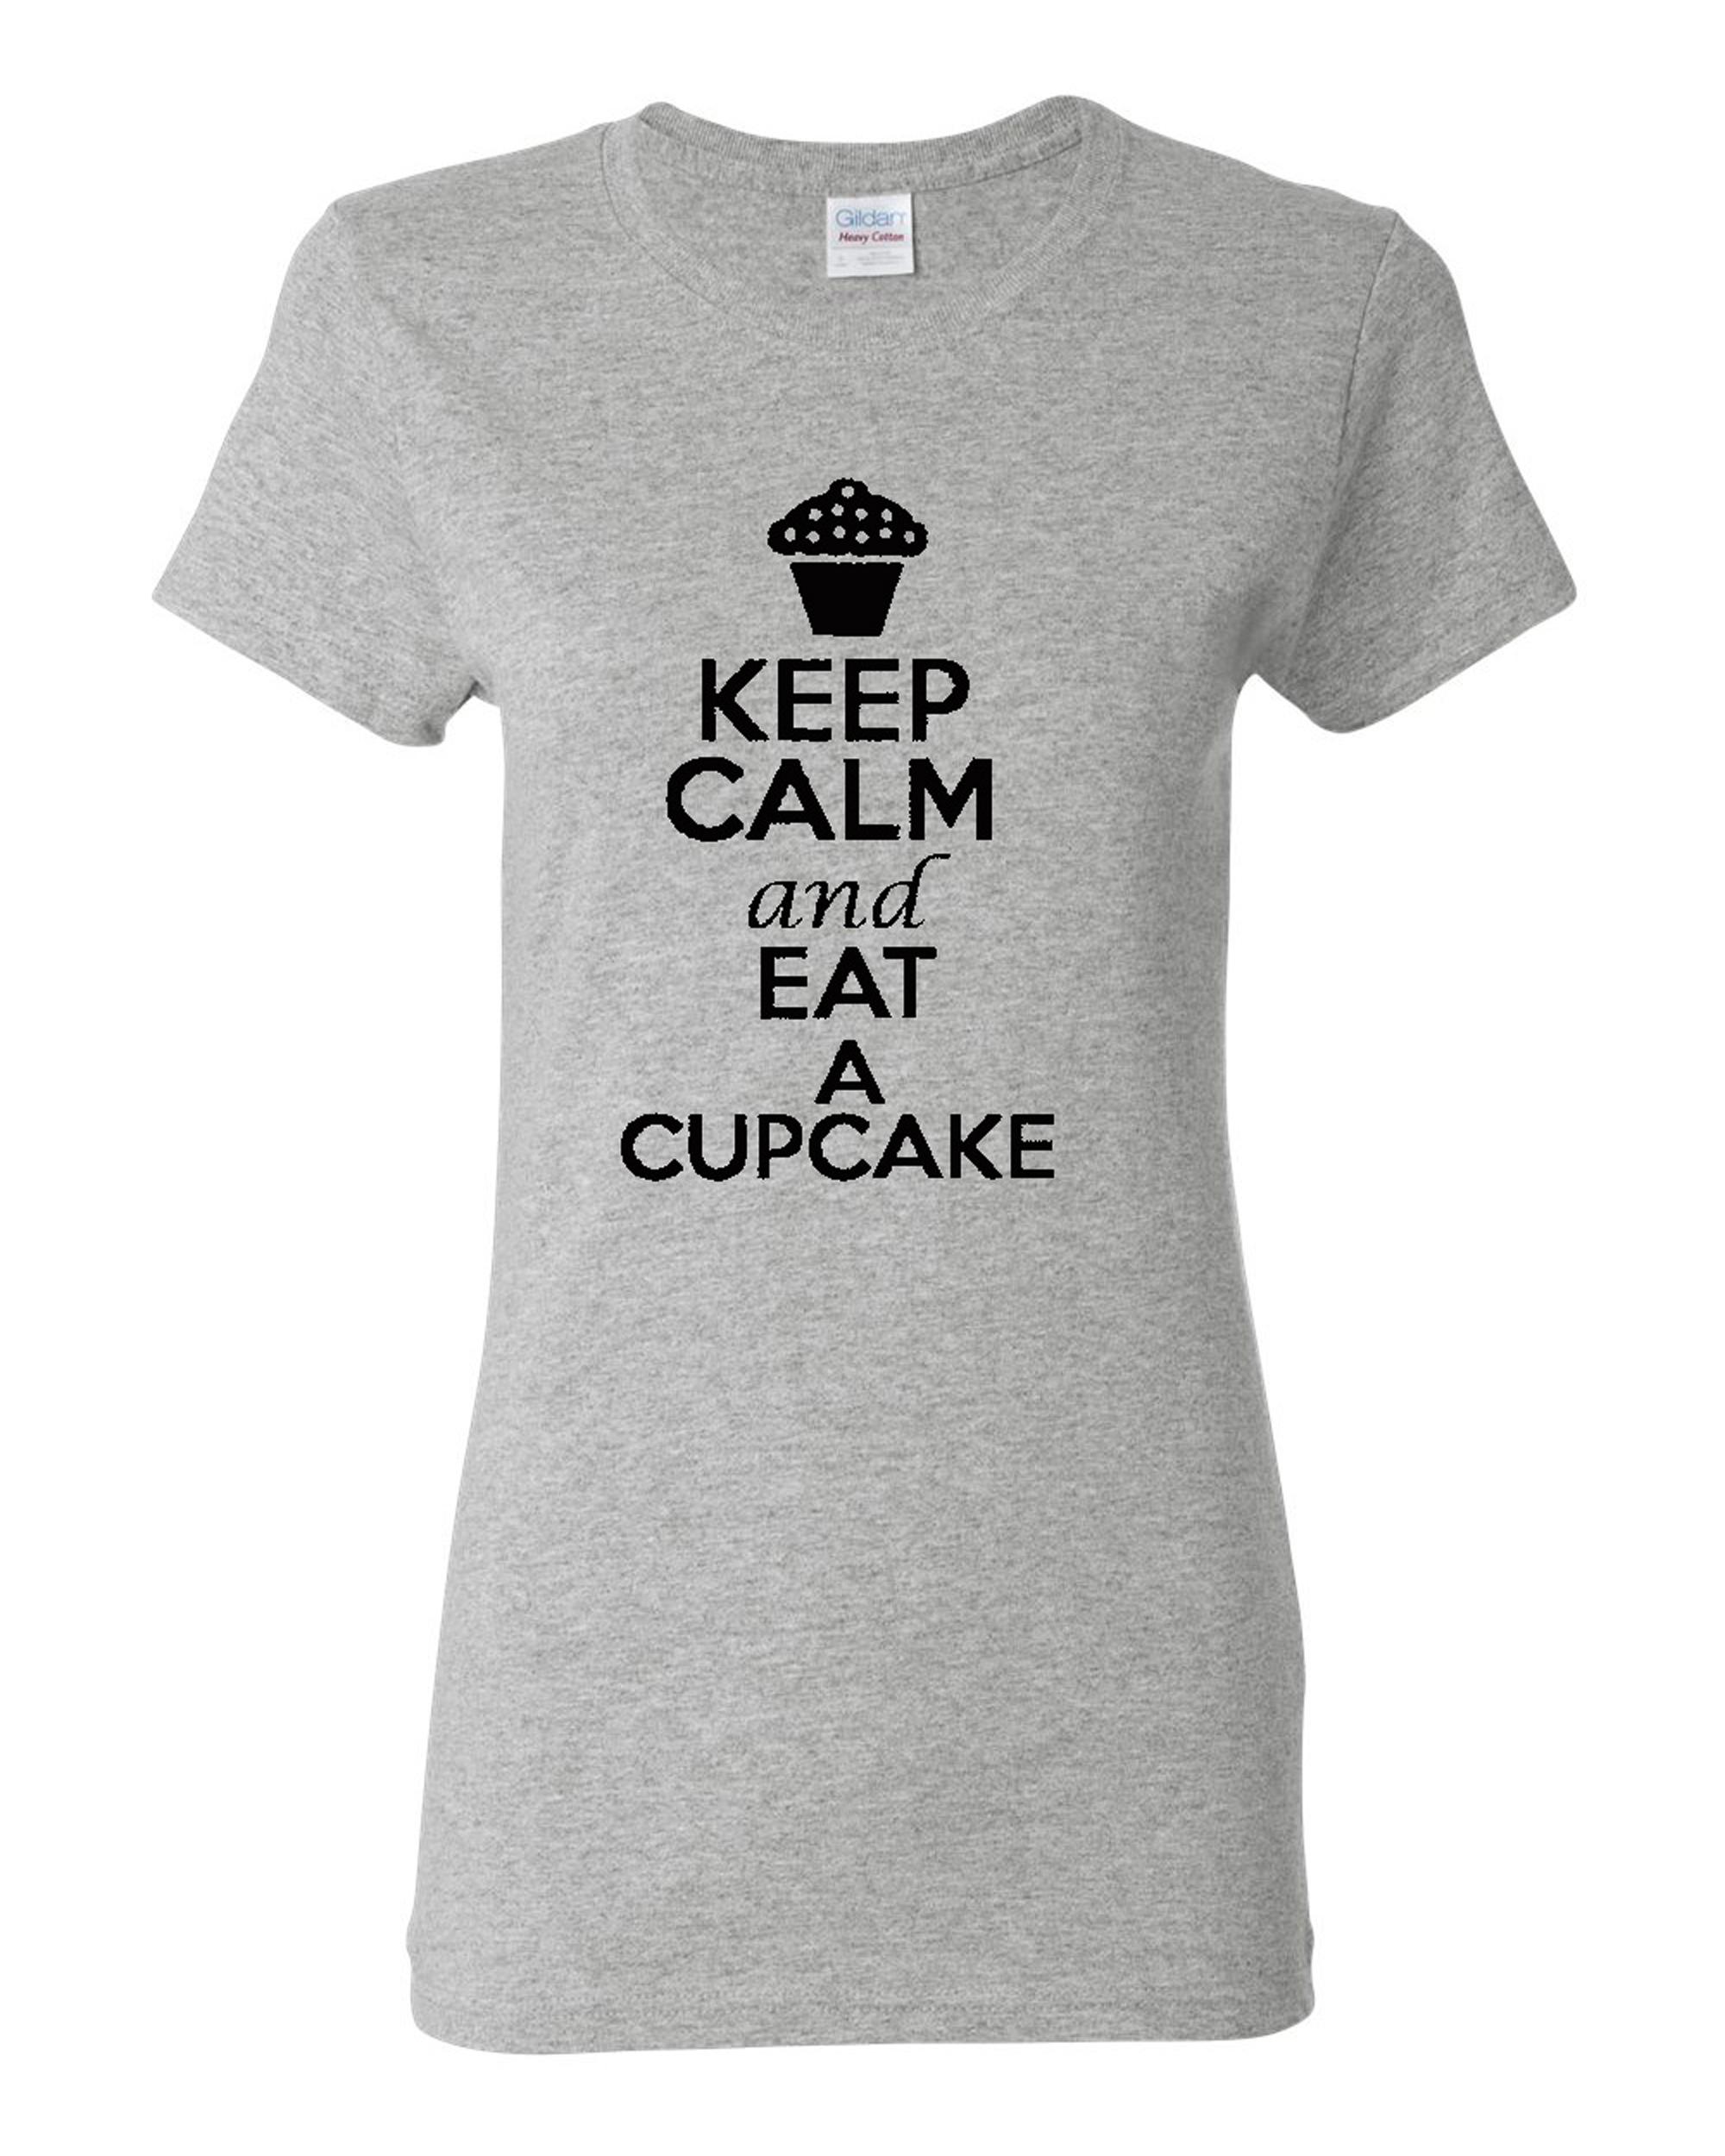 Ladies Keep Calm and Eat A Cupcake T-Shirt Tee